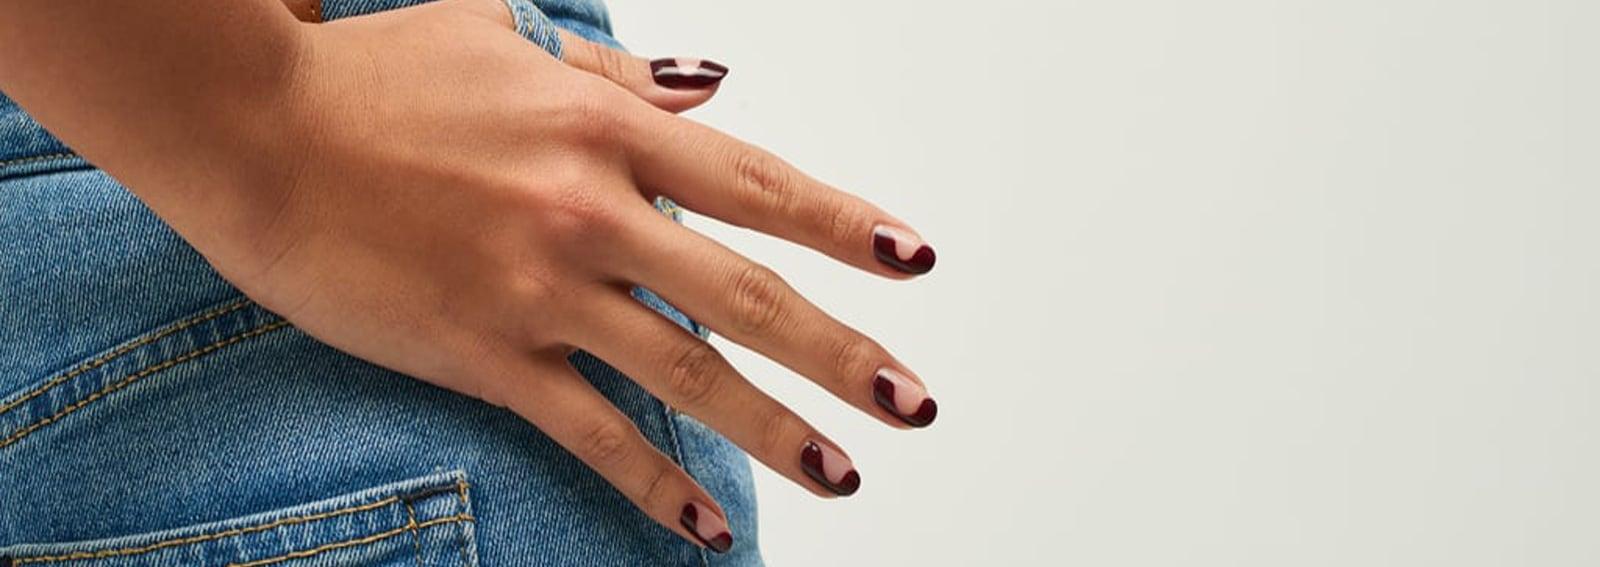 wavy-nail-art-manicure-a-onda-cover-desktop-01